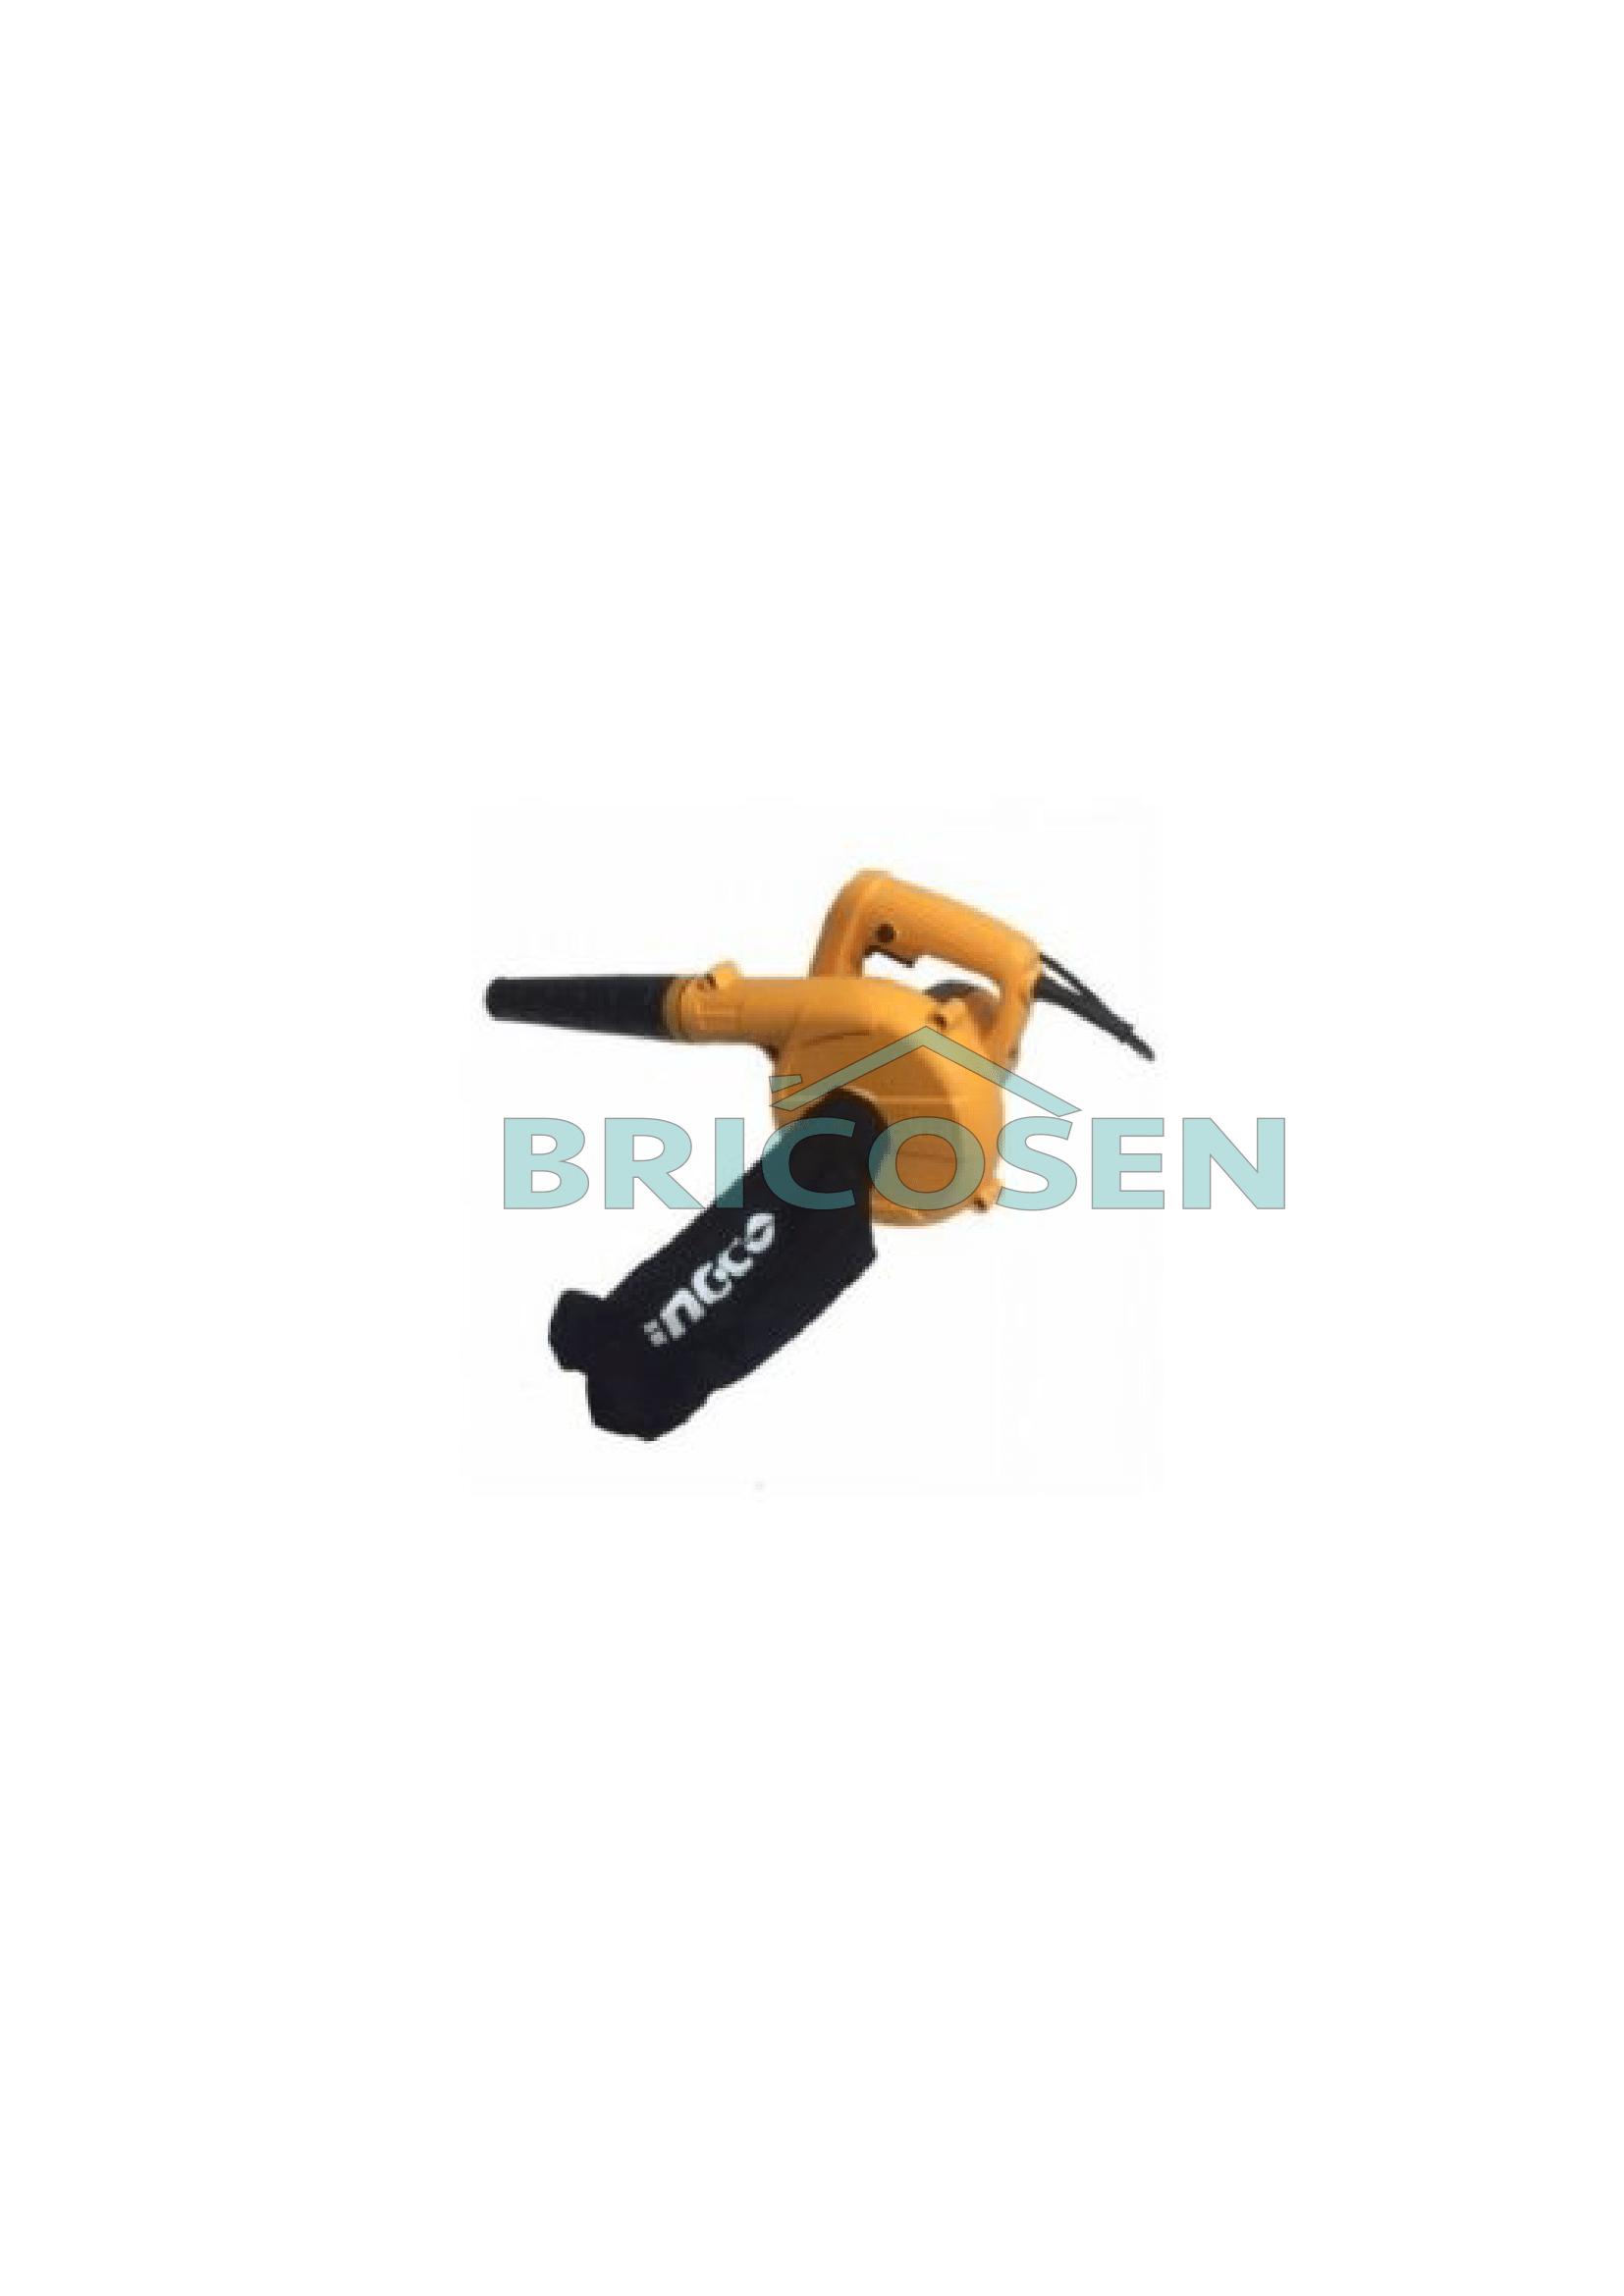 aspirateur souffleur ingco ab6008 bricosen quincaillerie senegal